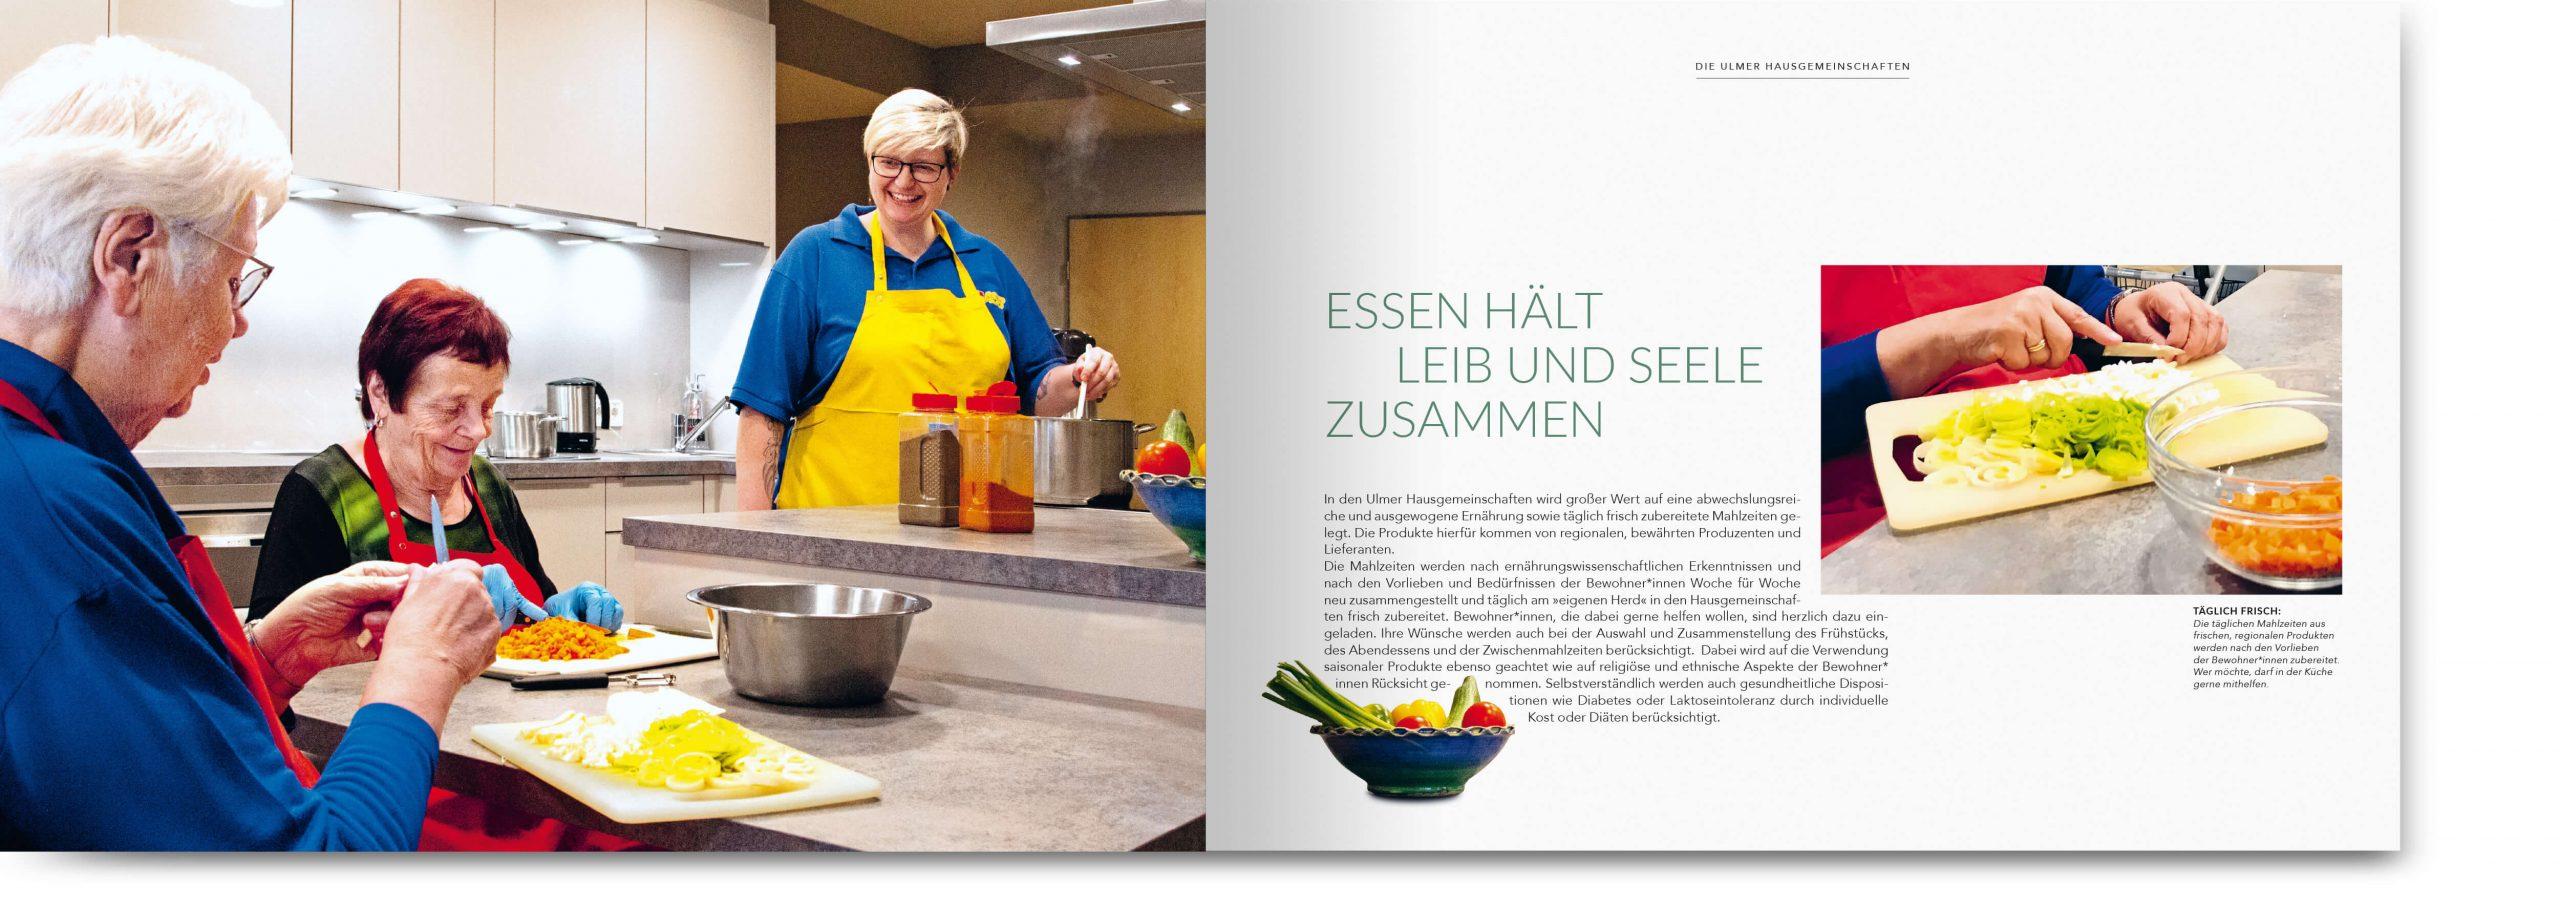 fh-web-asb-broschüren-ulm-5-scaled.jpg